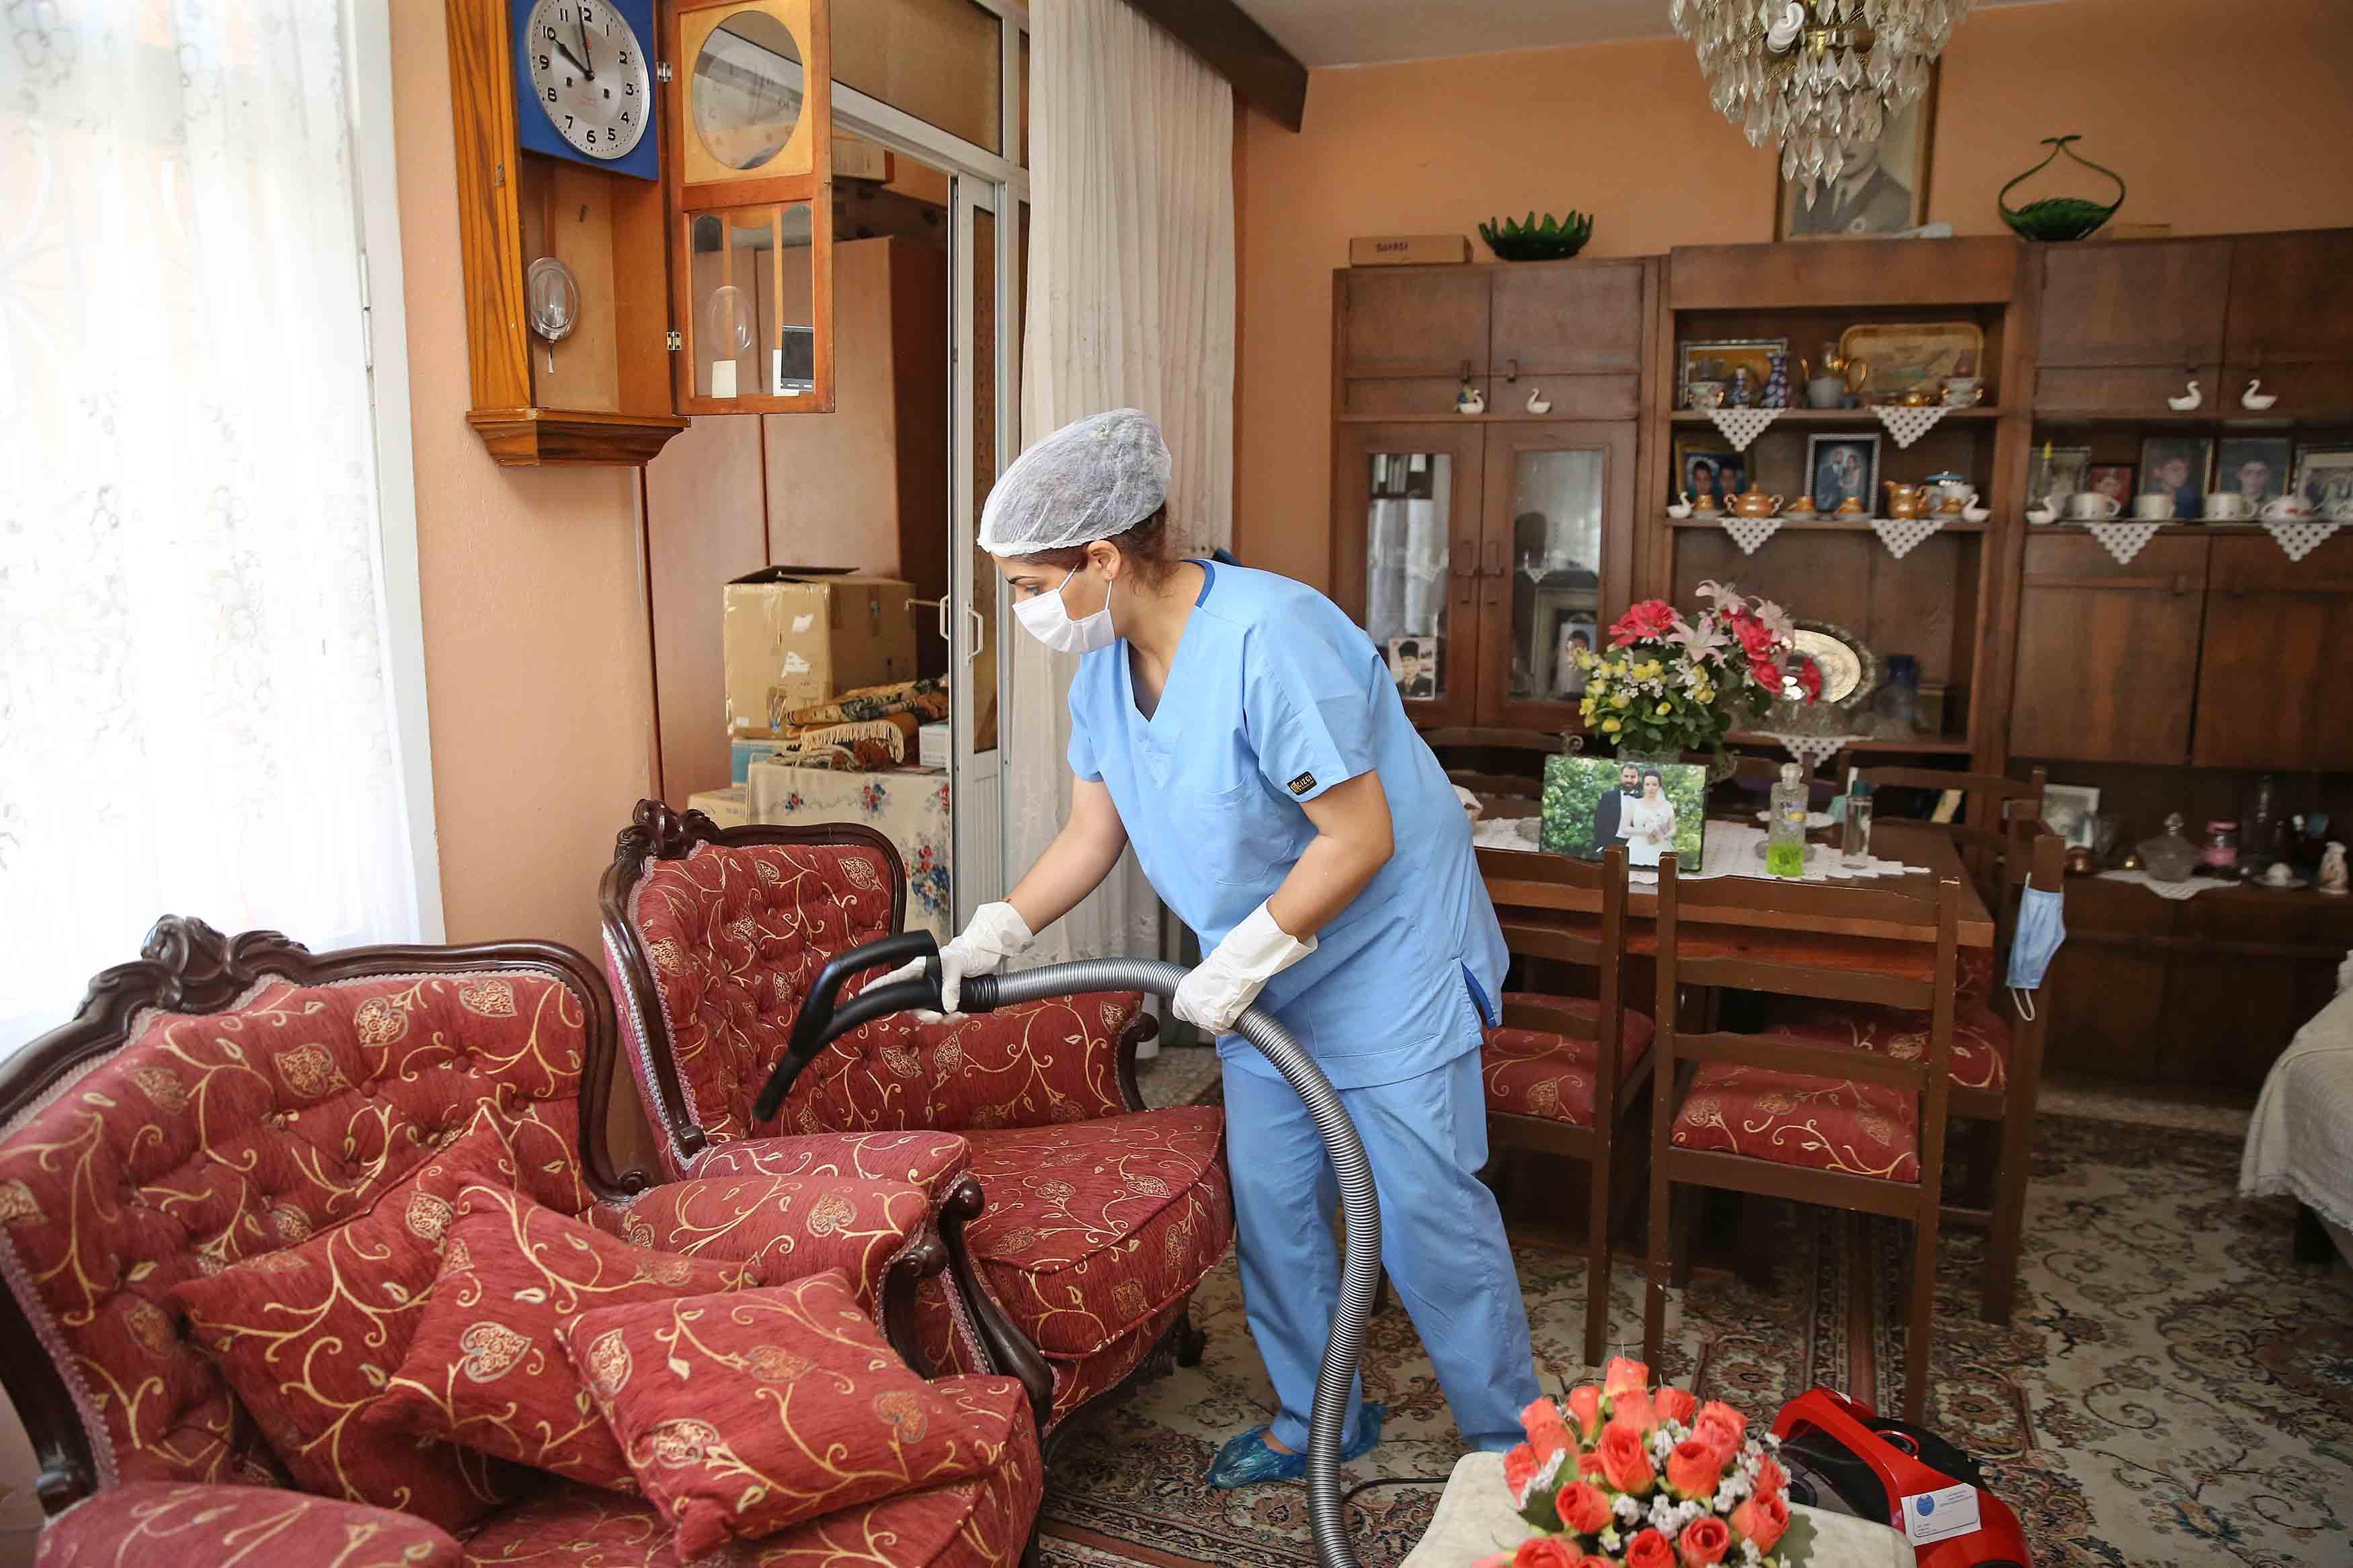 ESDEM'den vatandaşlara temizlik hizmeti